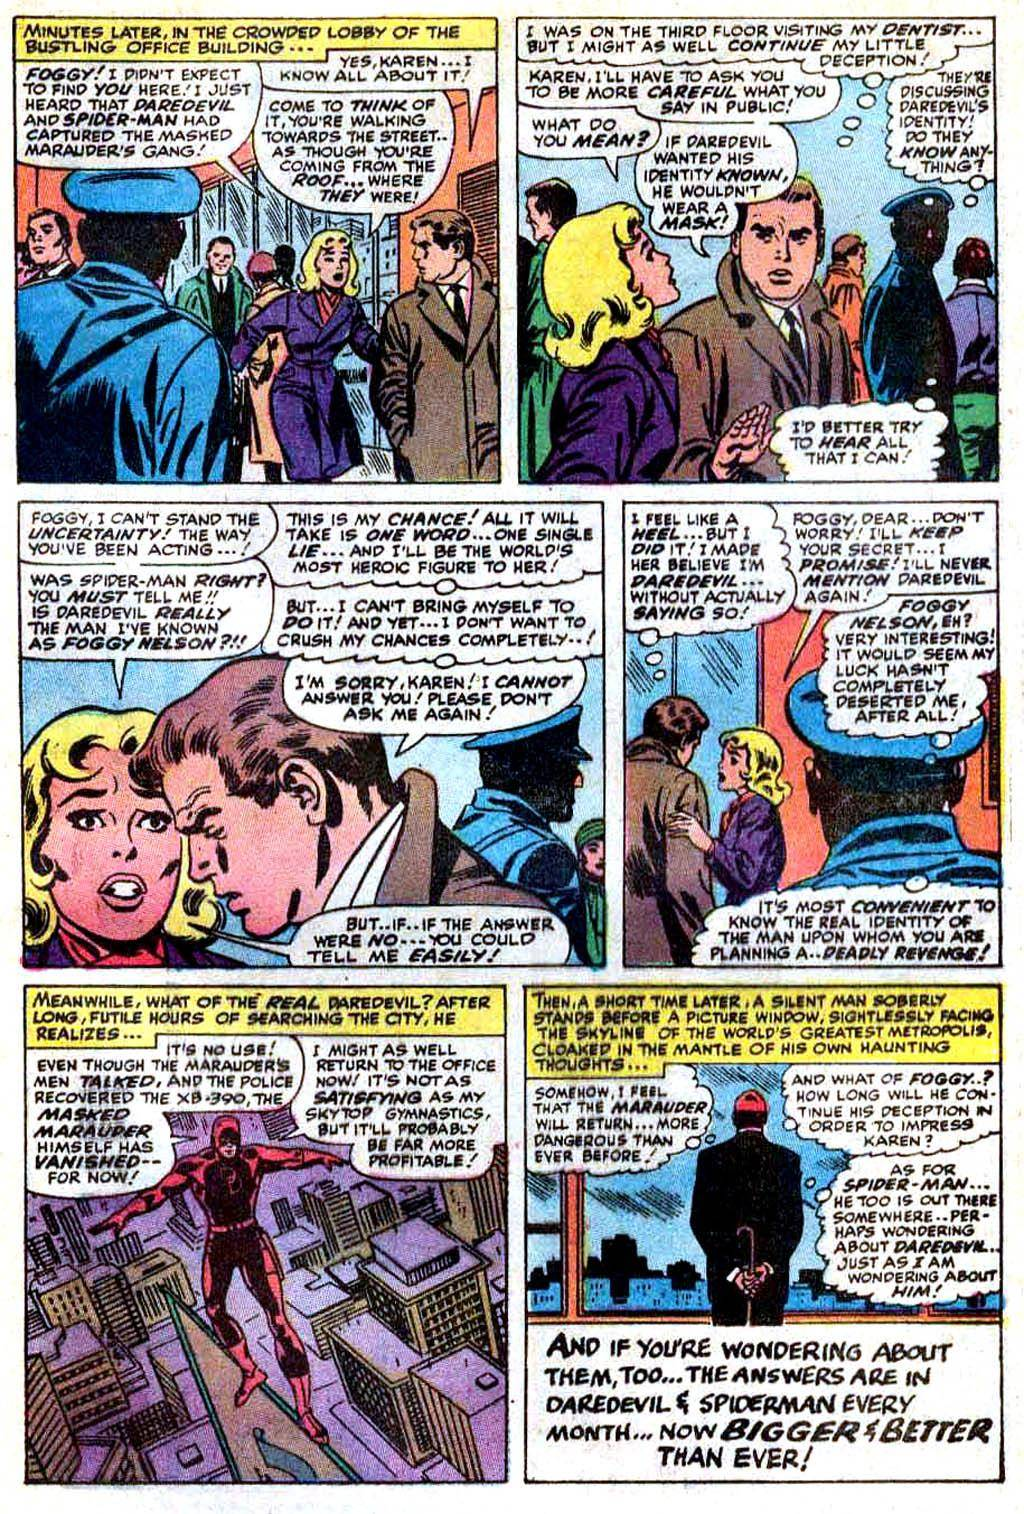 Daredevil v1 Annual 03 1971 Enter Spider-man